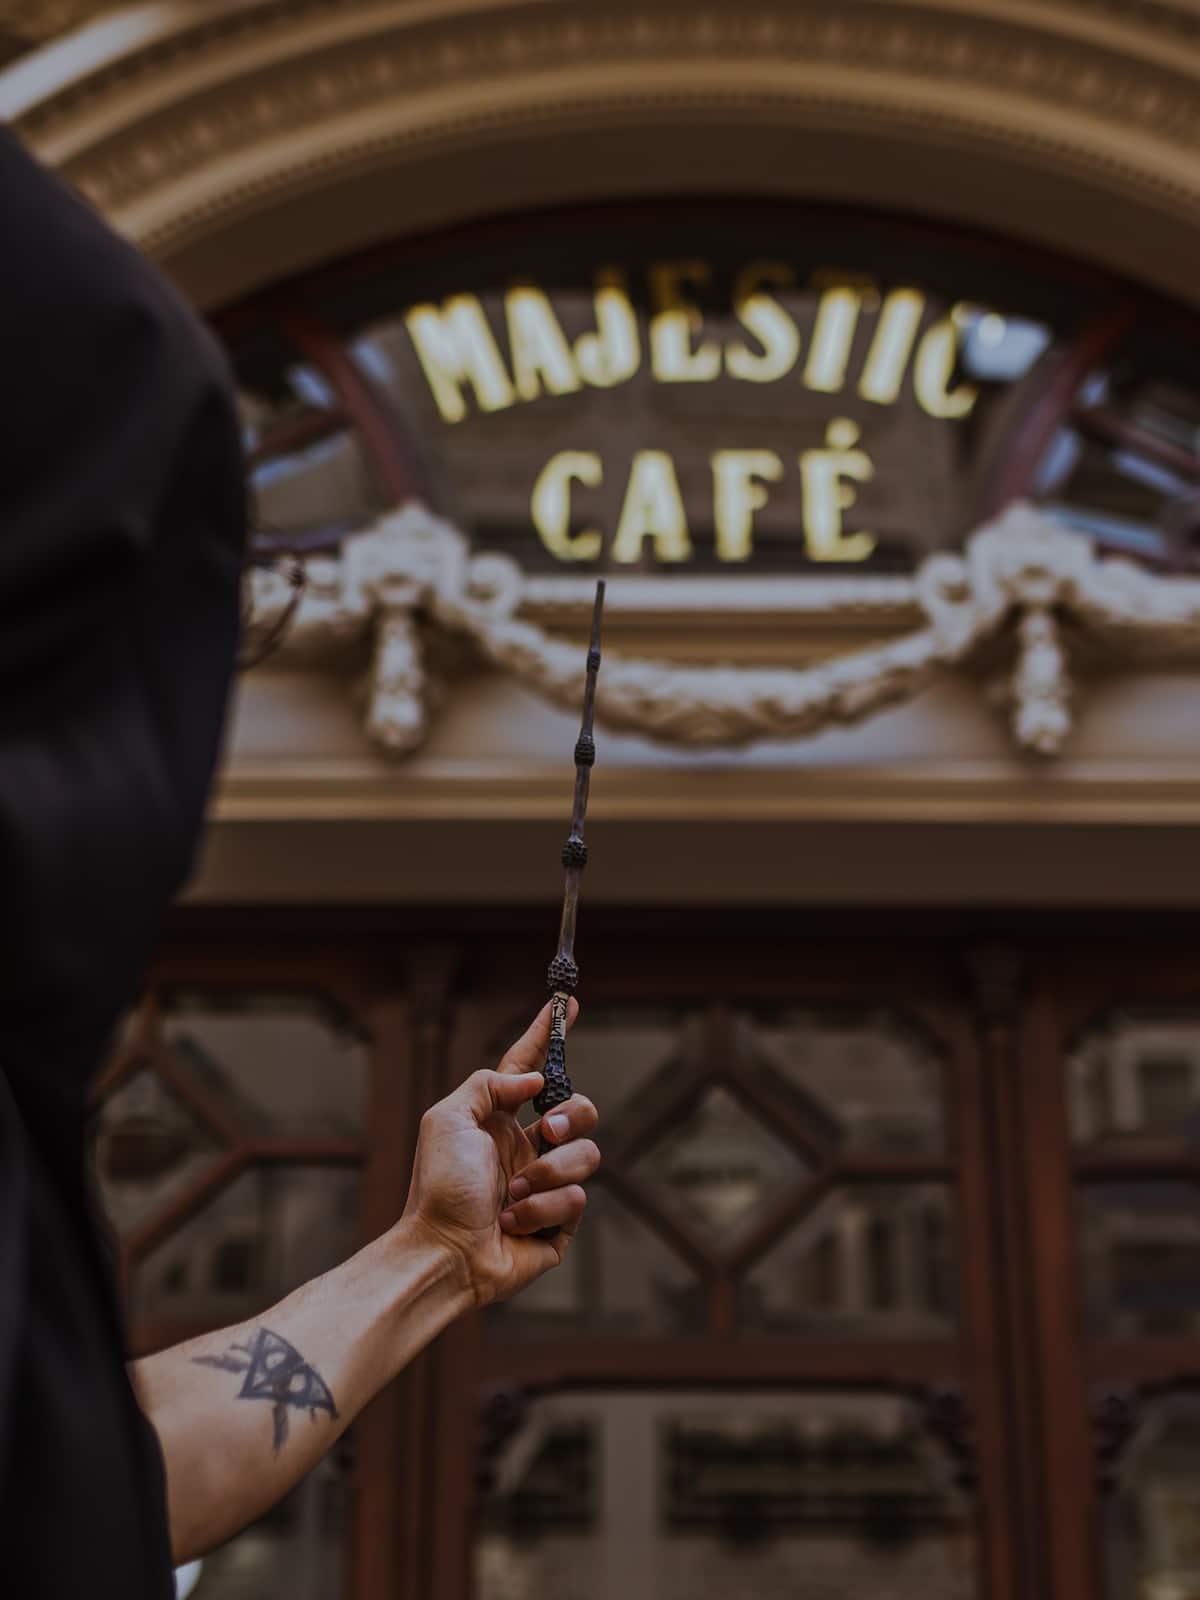 Harry Potter and Porto Majestic Cafe